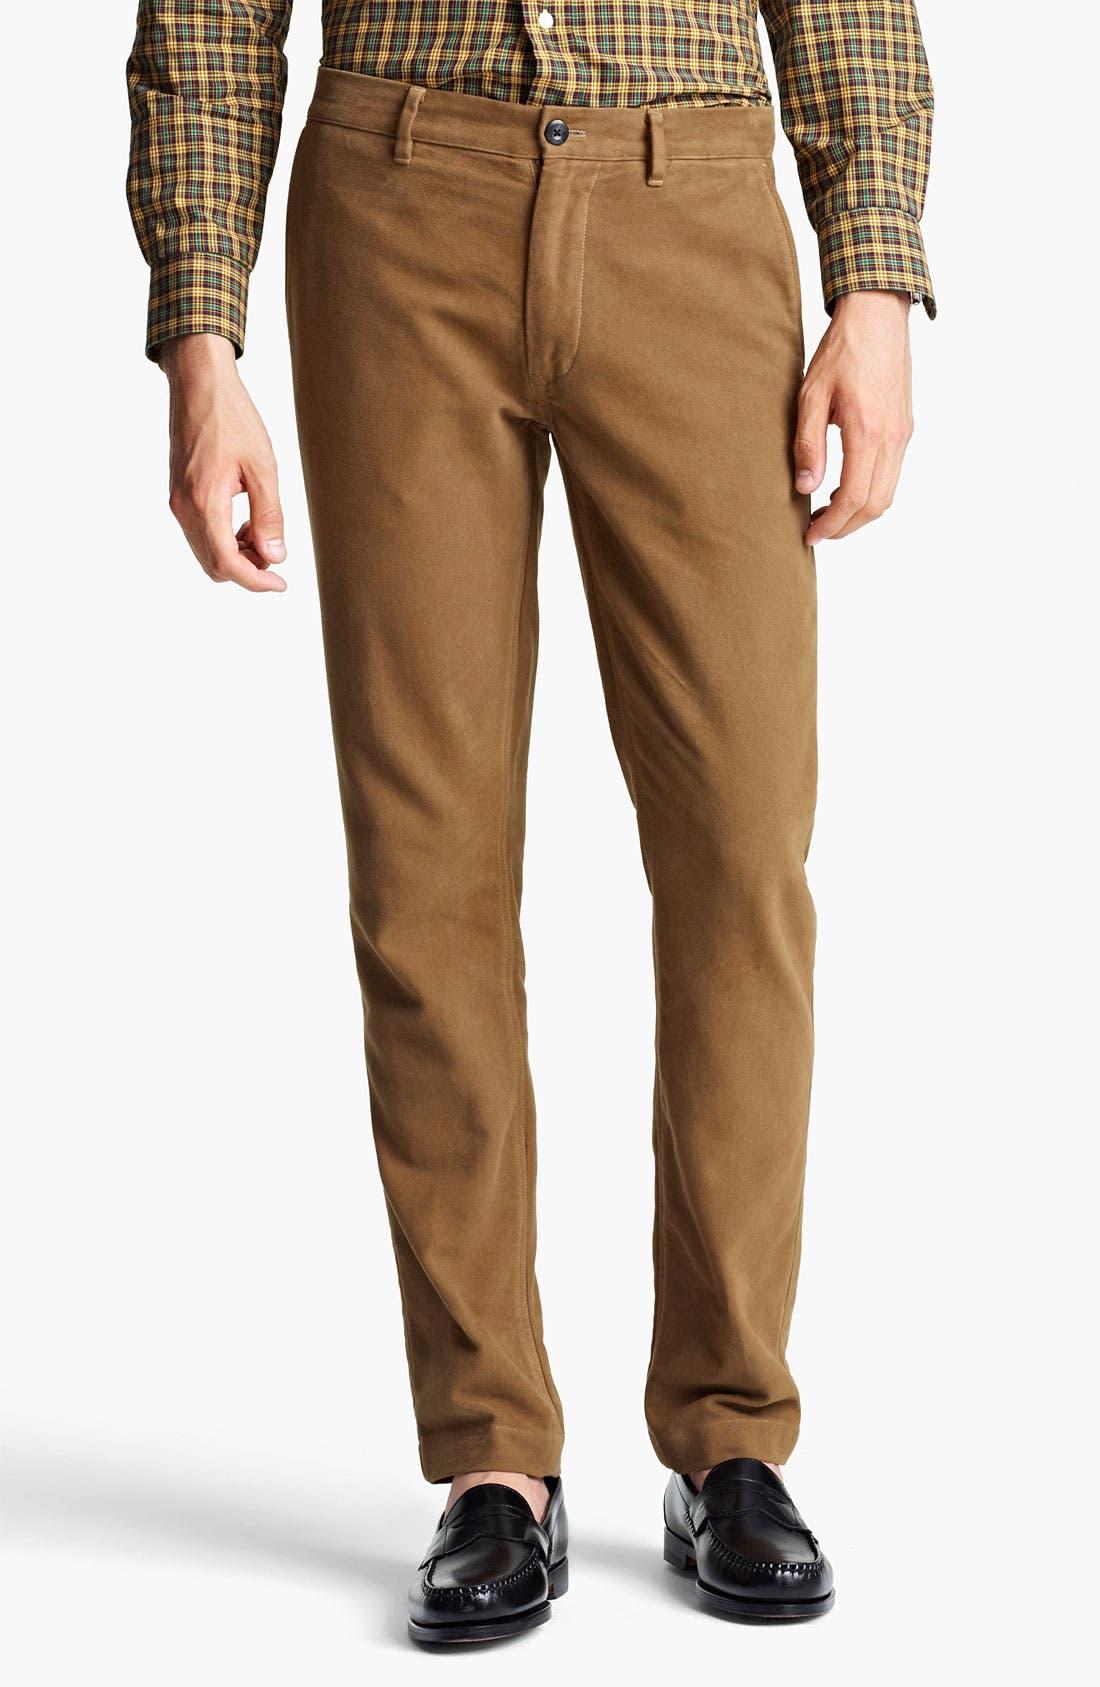 Main Image - Jack Spade 'Dwight' Moleskin Cotton Trousers